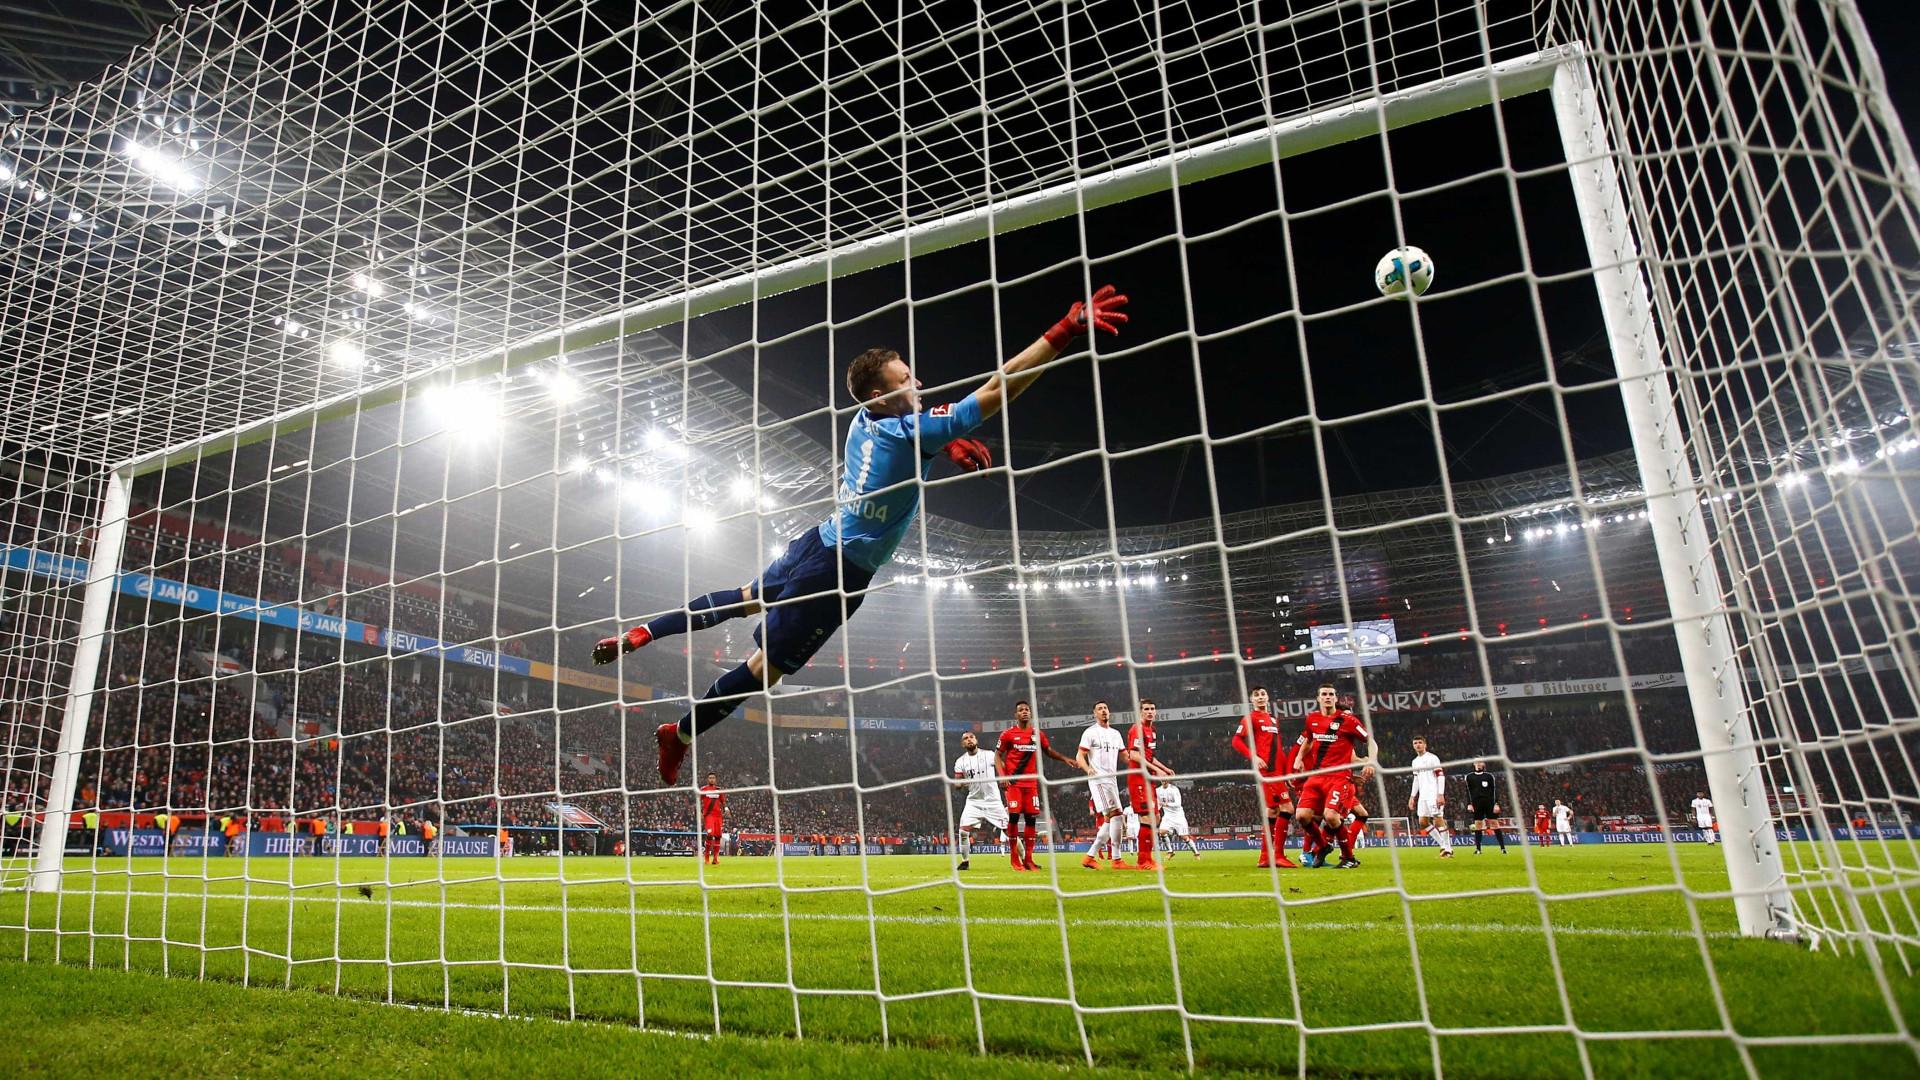 Continua o passeio do Bayern de Munique no campeonato